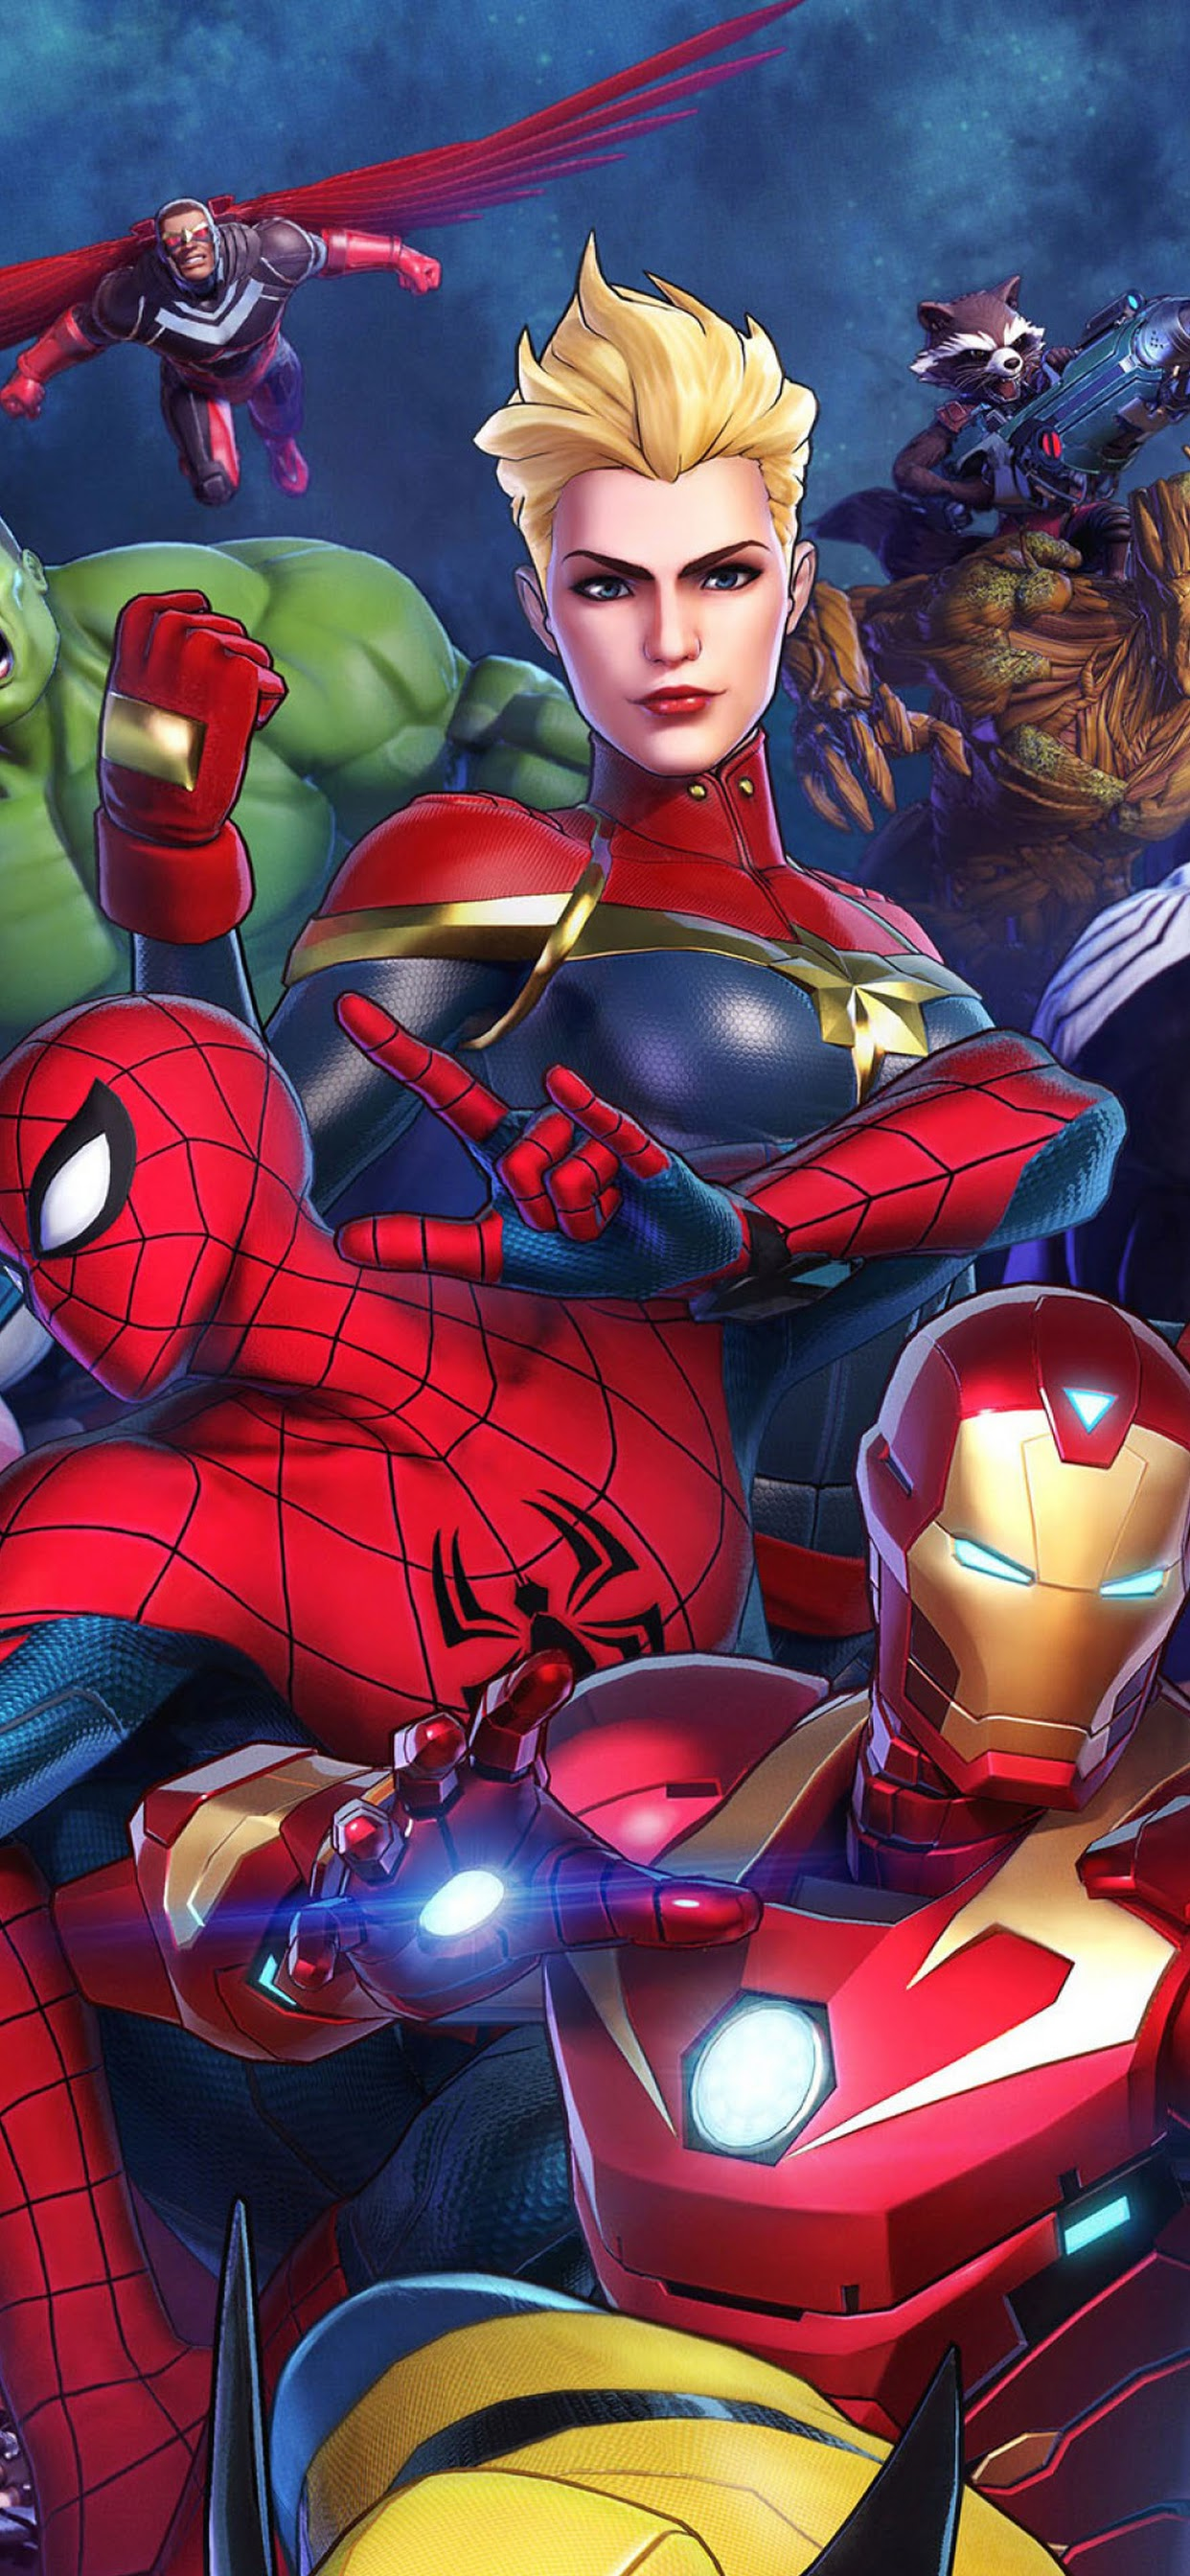 Marvel Ultimate Alliance 3 Characters 4k Wallpaper 46